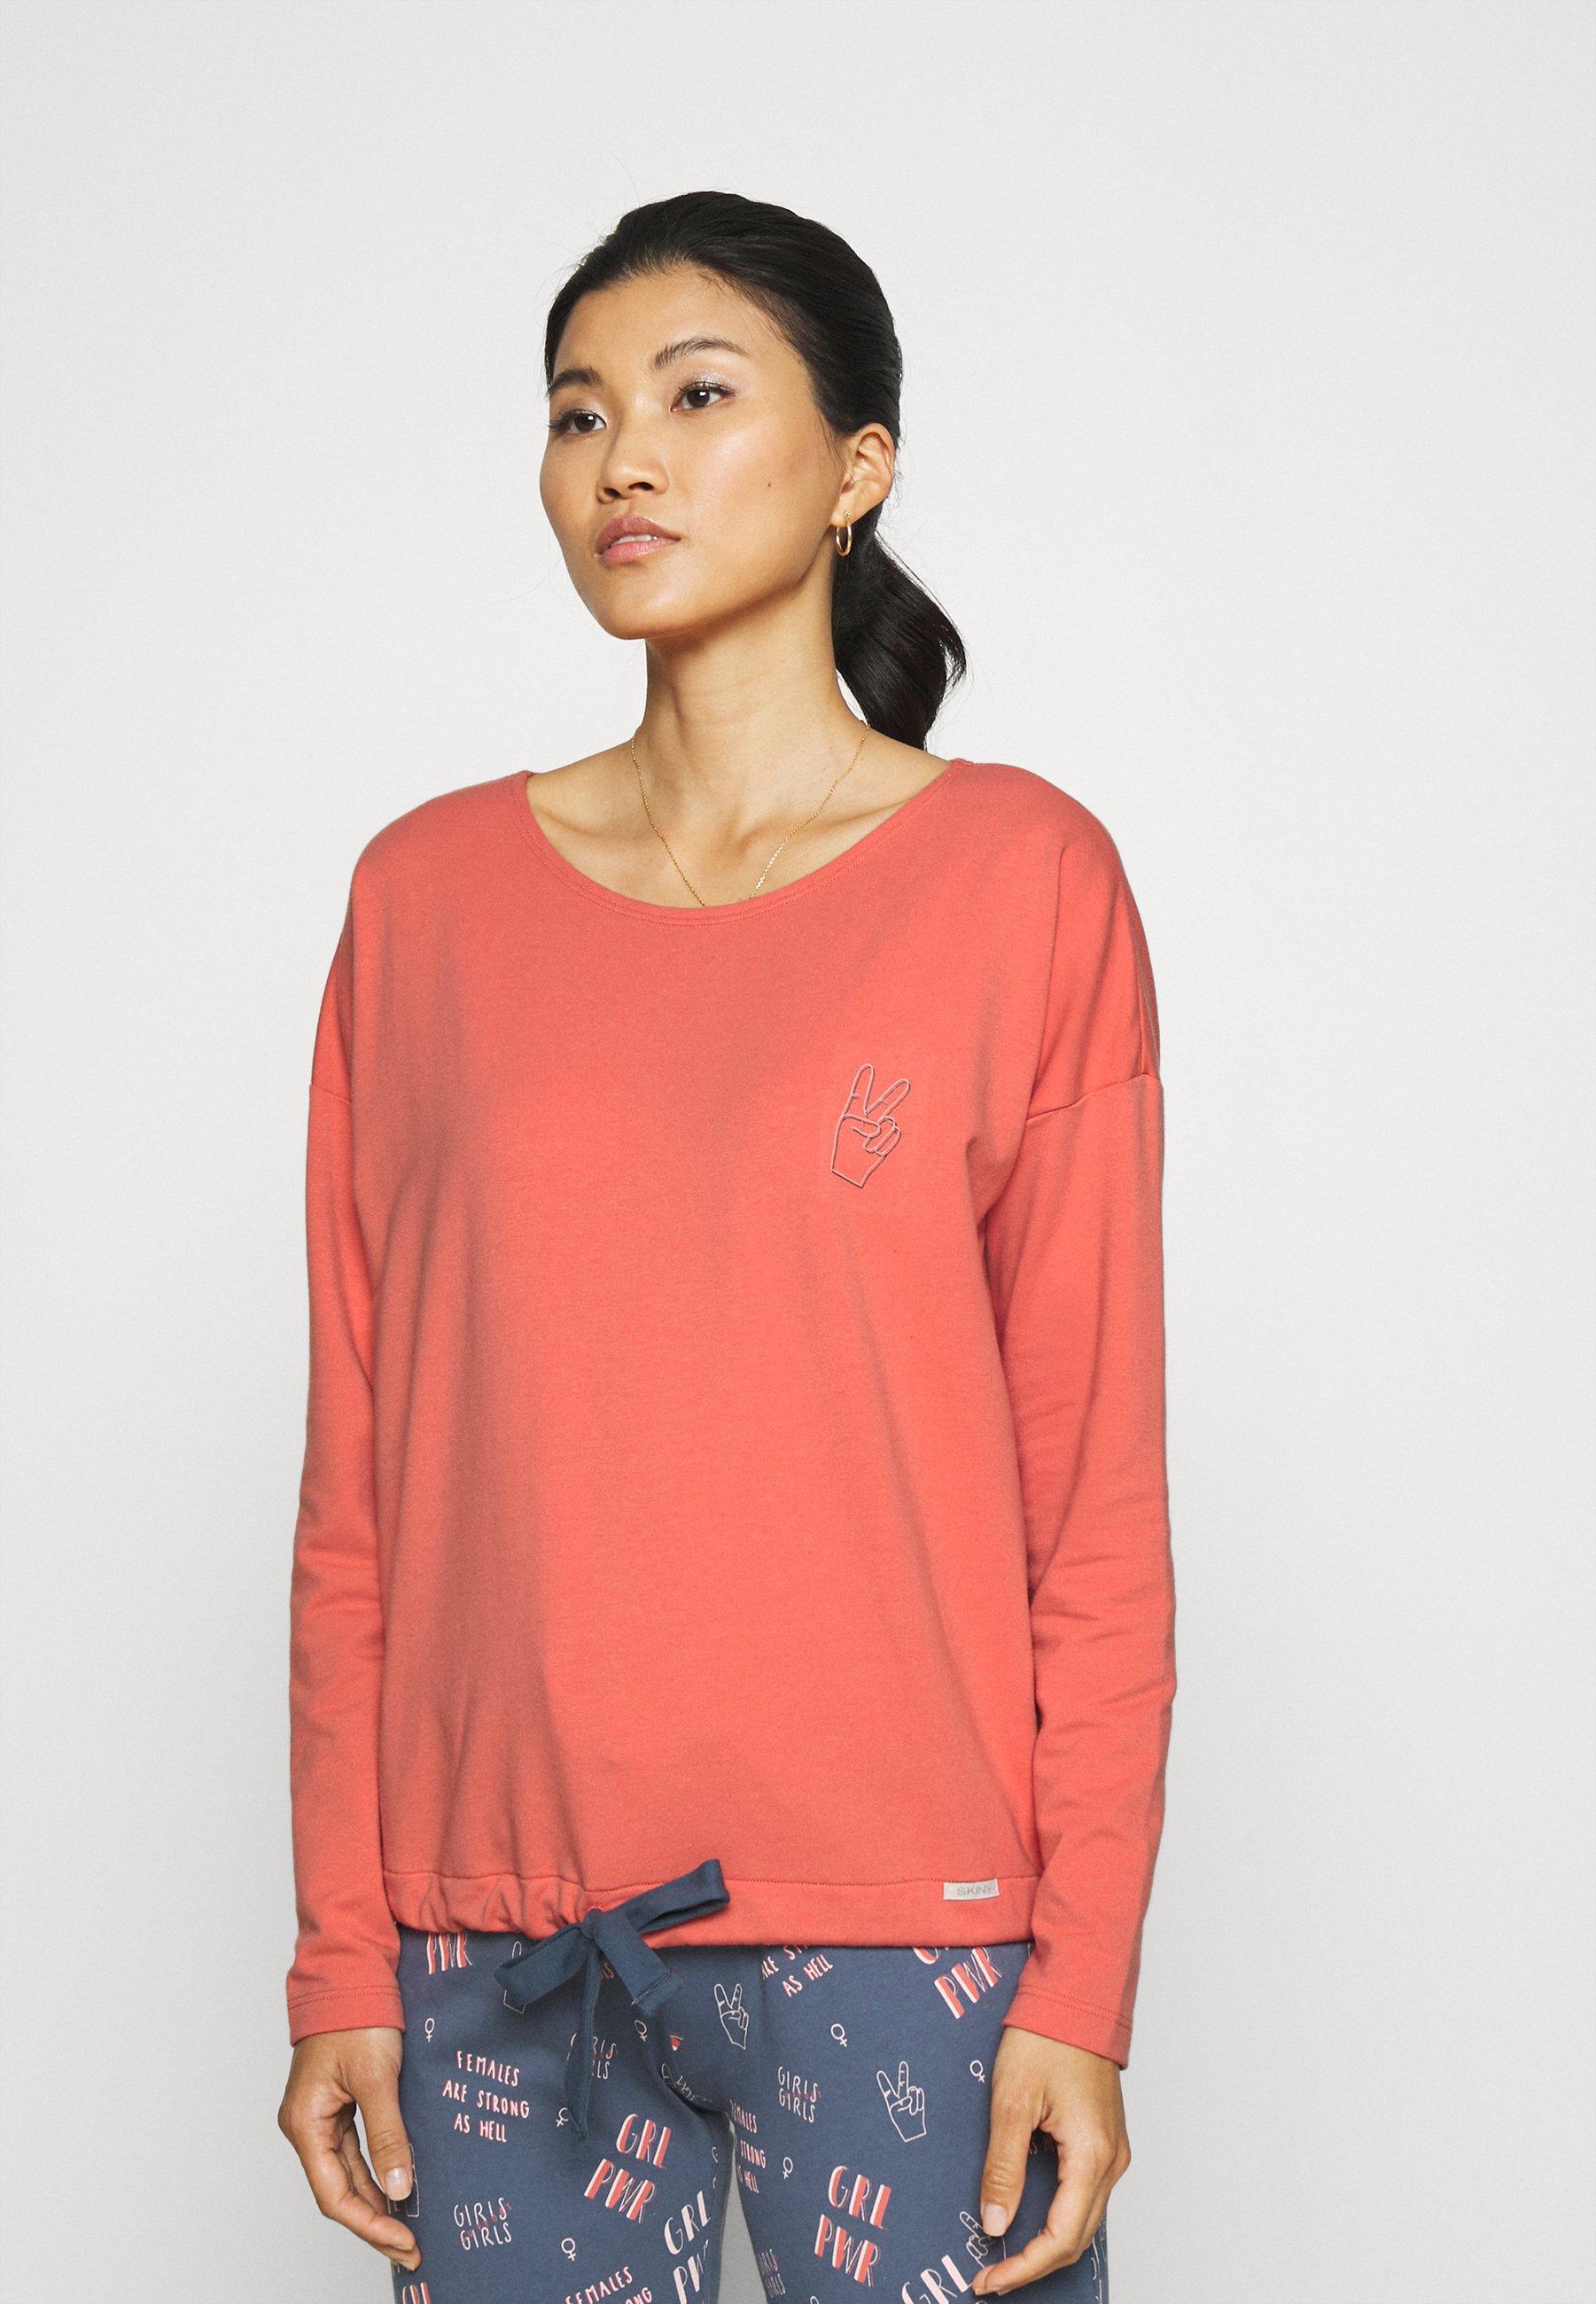 Damen DAMEN LANGARM - Nachtwäsche Shirt